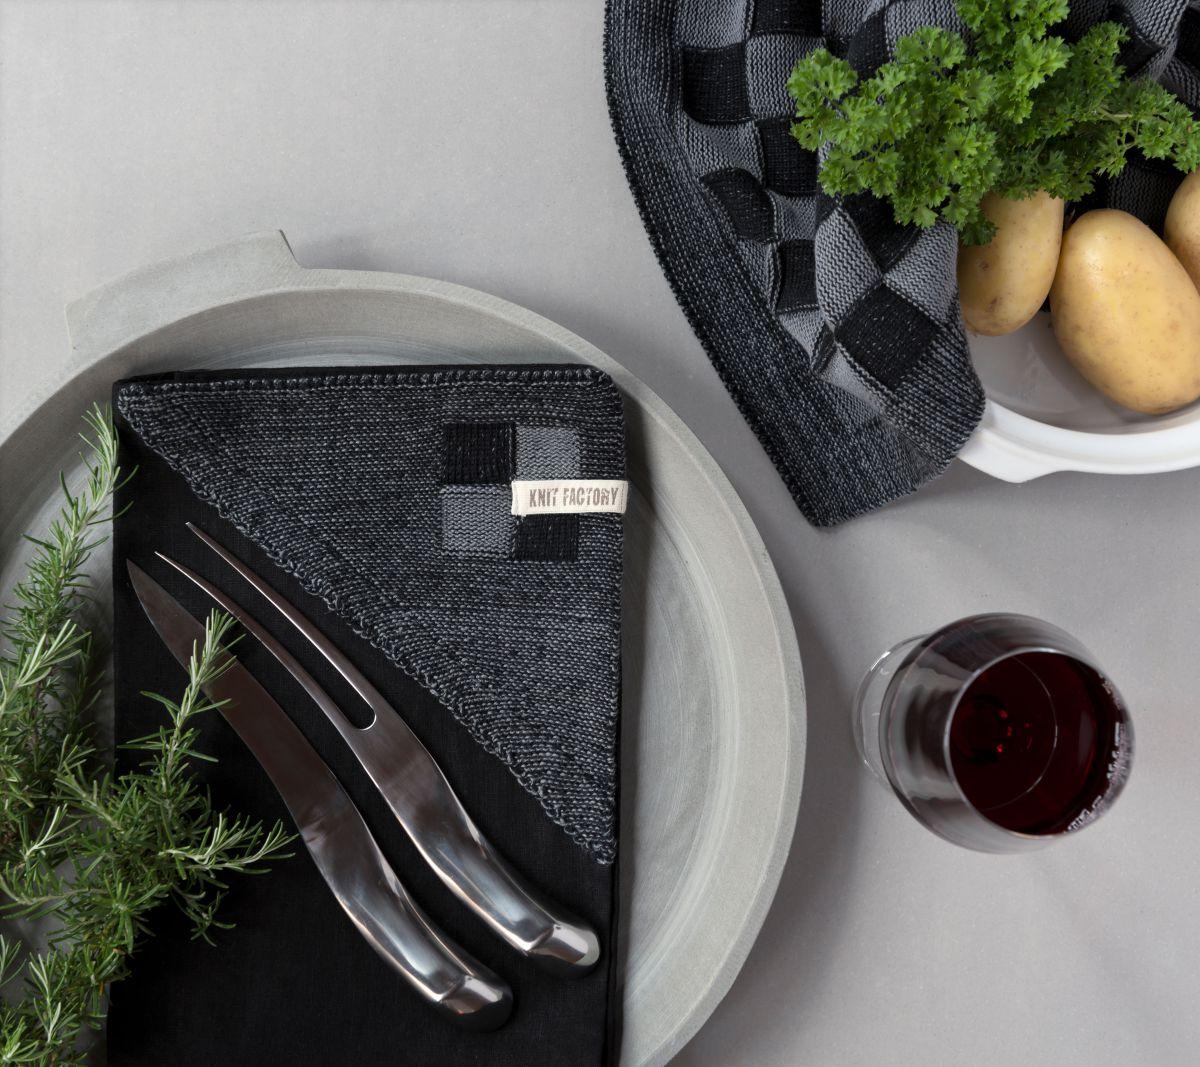 20100 knit factory keukendoek block zwart 7